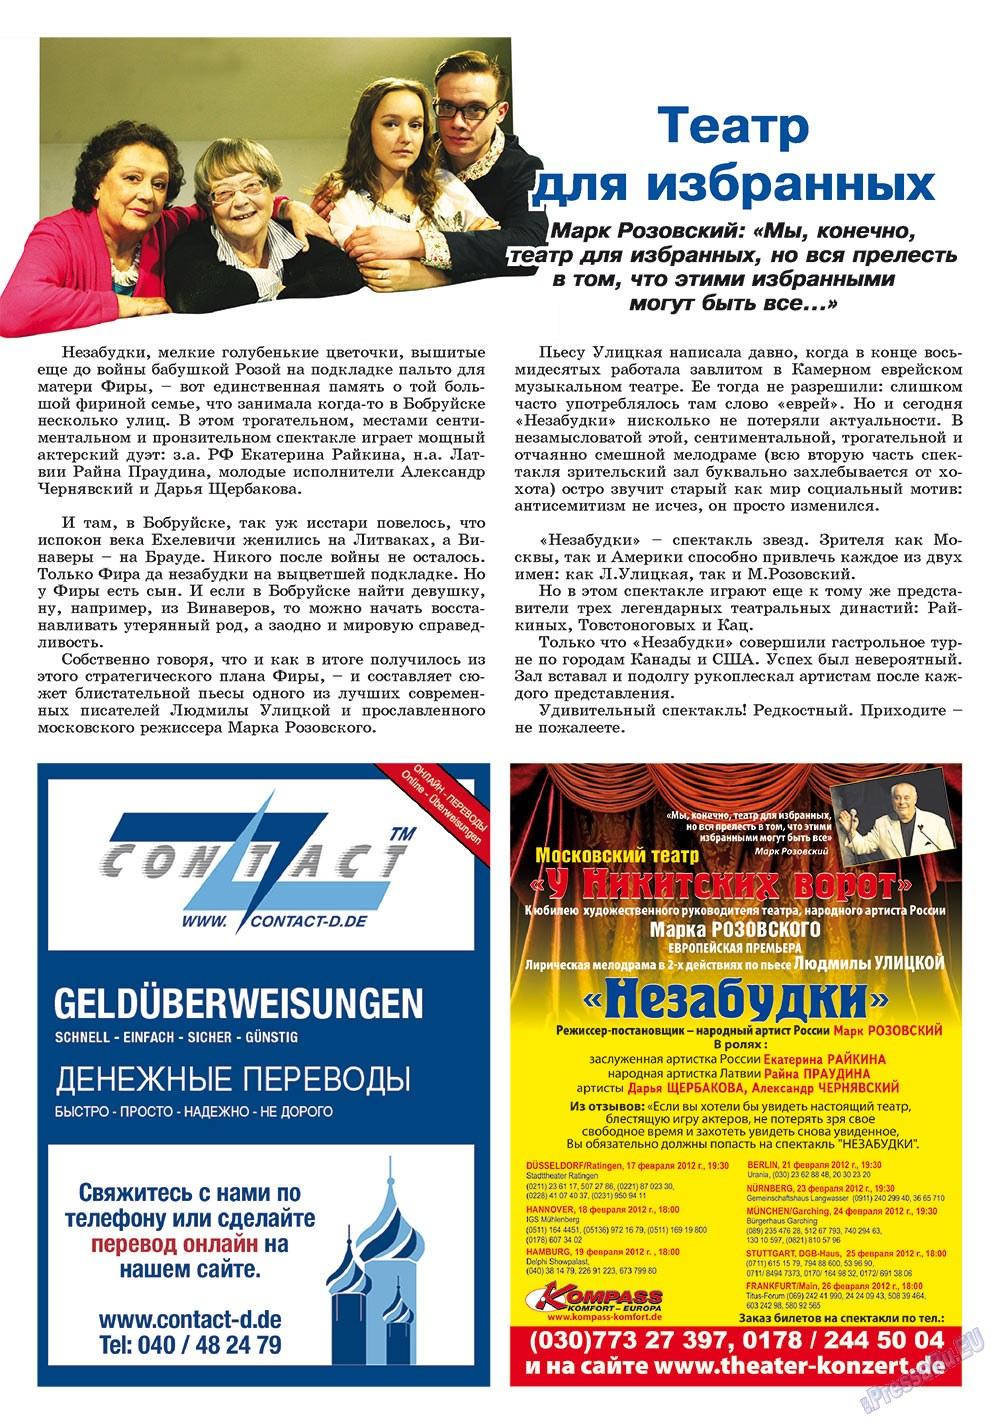 Партнер-север (журнал). 2012 год, номер 1, стр. 66